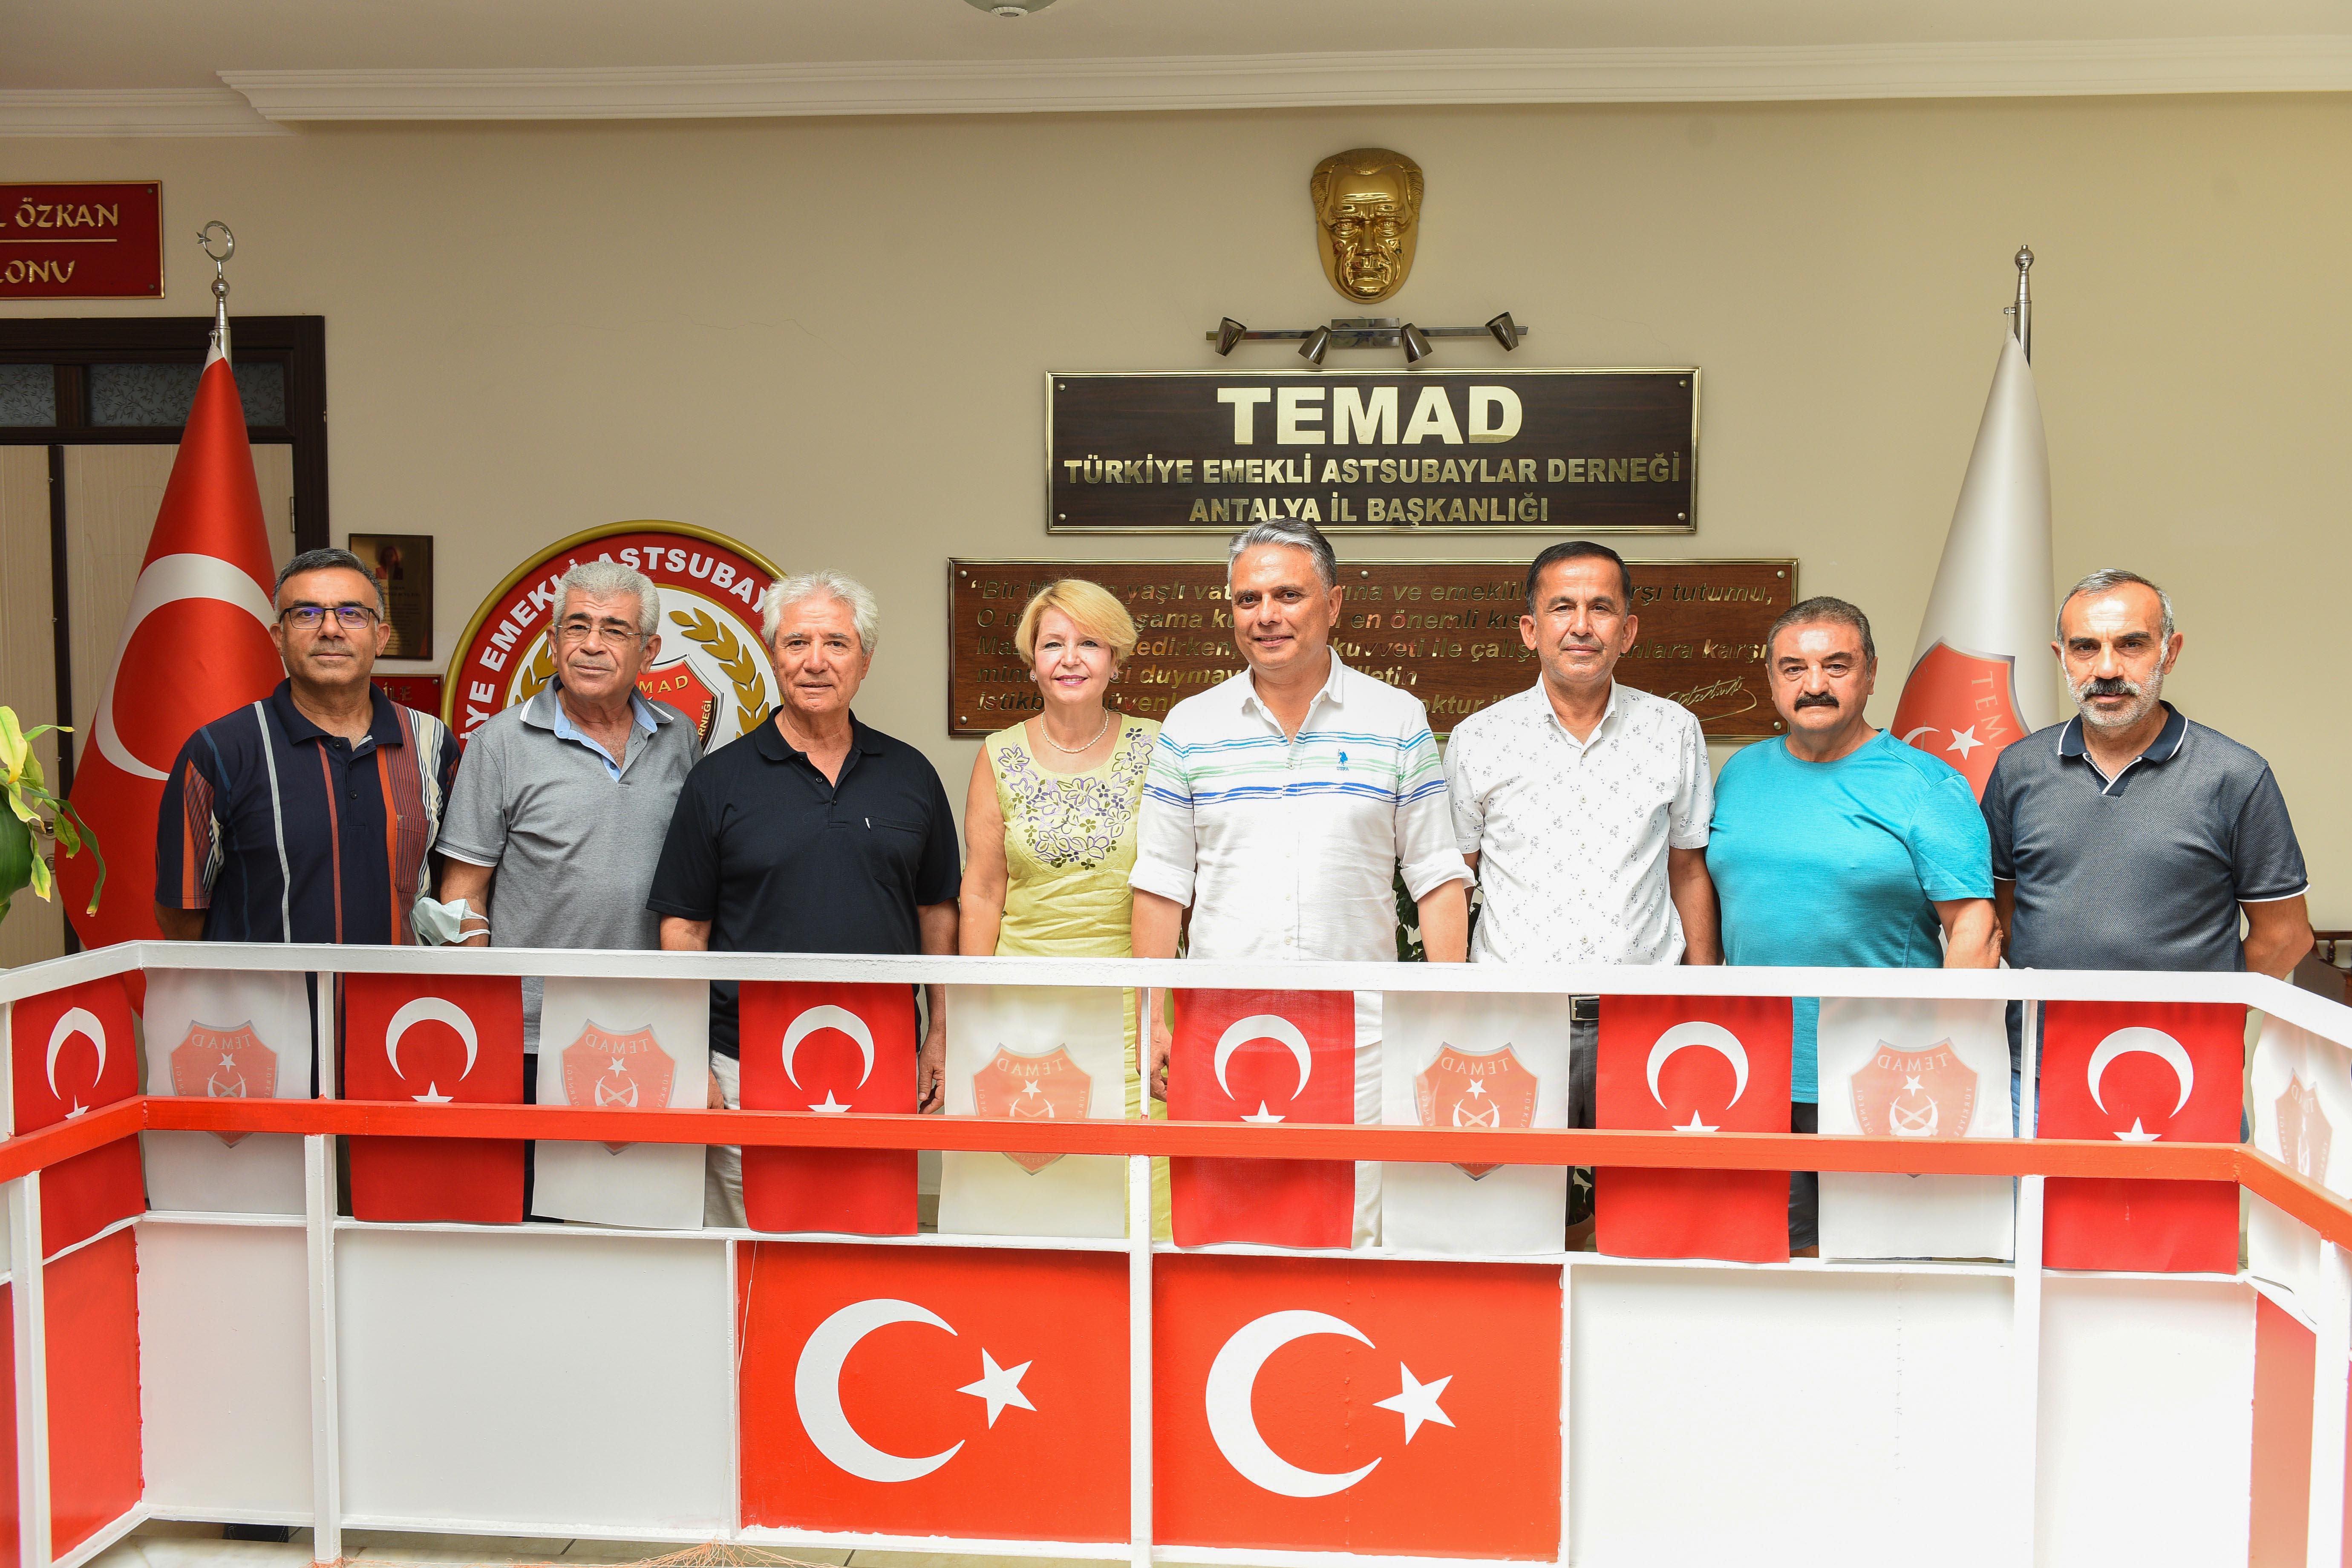 Başkan Uysal'dan TEMAD ziyareti